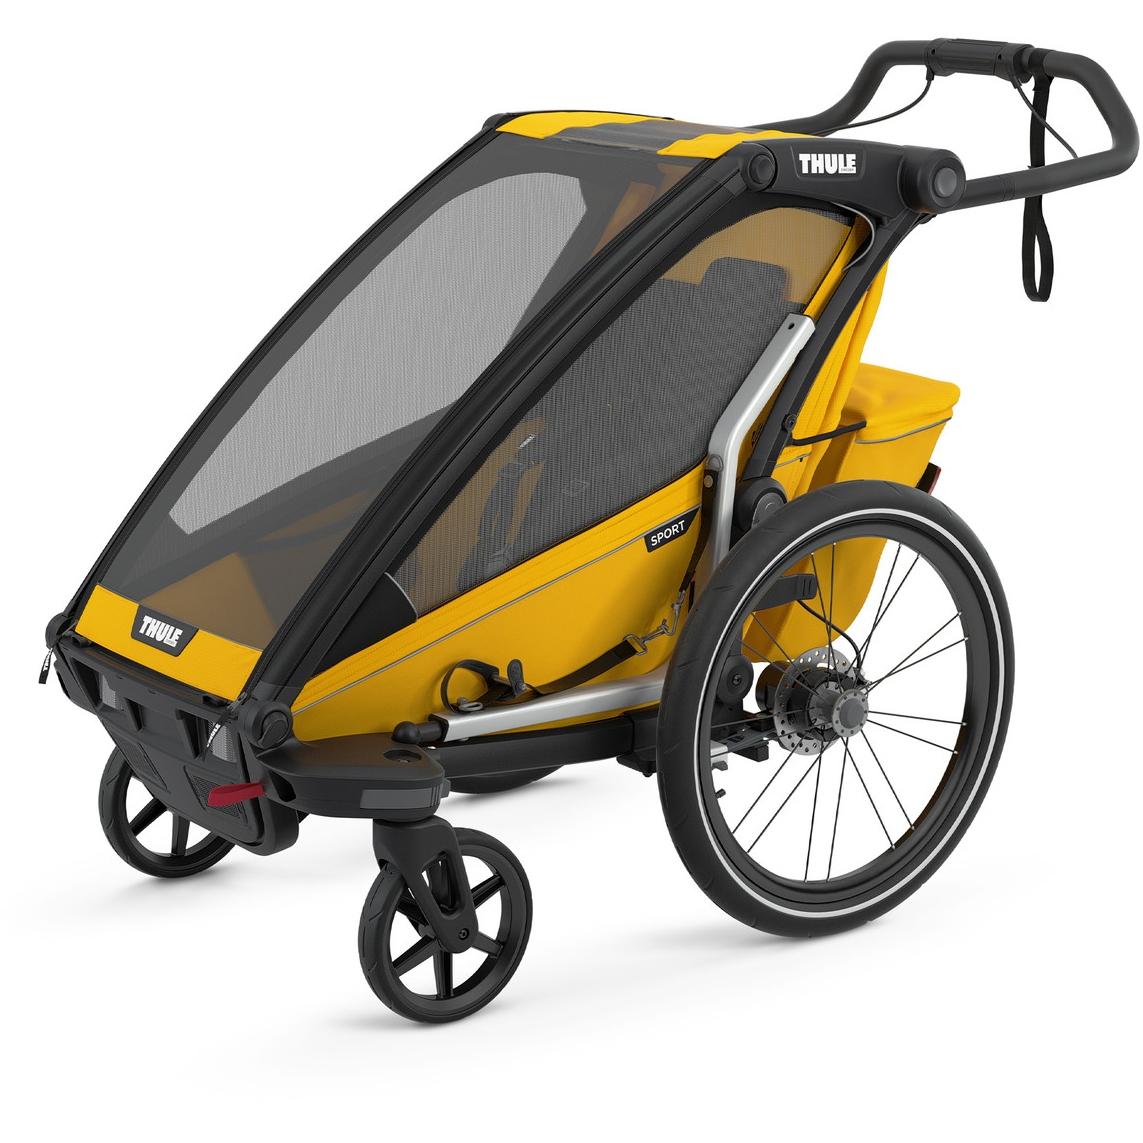 Foto de Thule Chariot Sport 1 - Remolque de bicicleta para 1 niño - spectra yellow